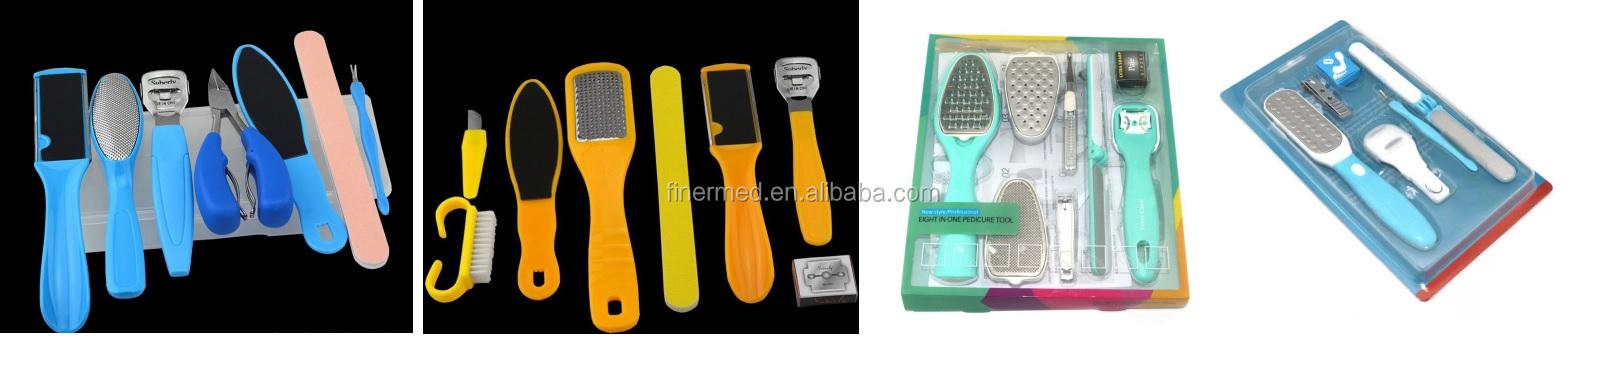 professional manicure pedicure tool